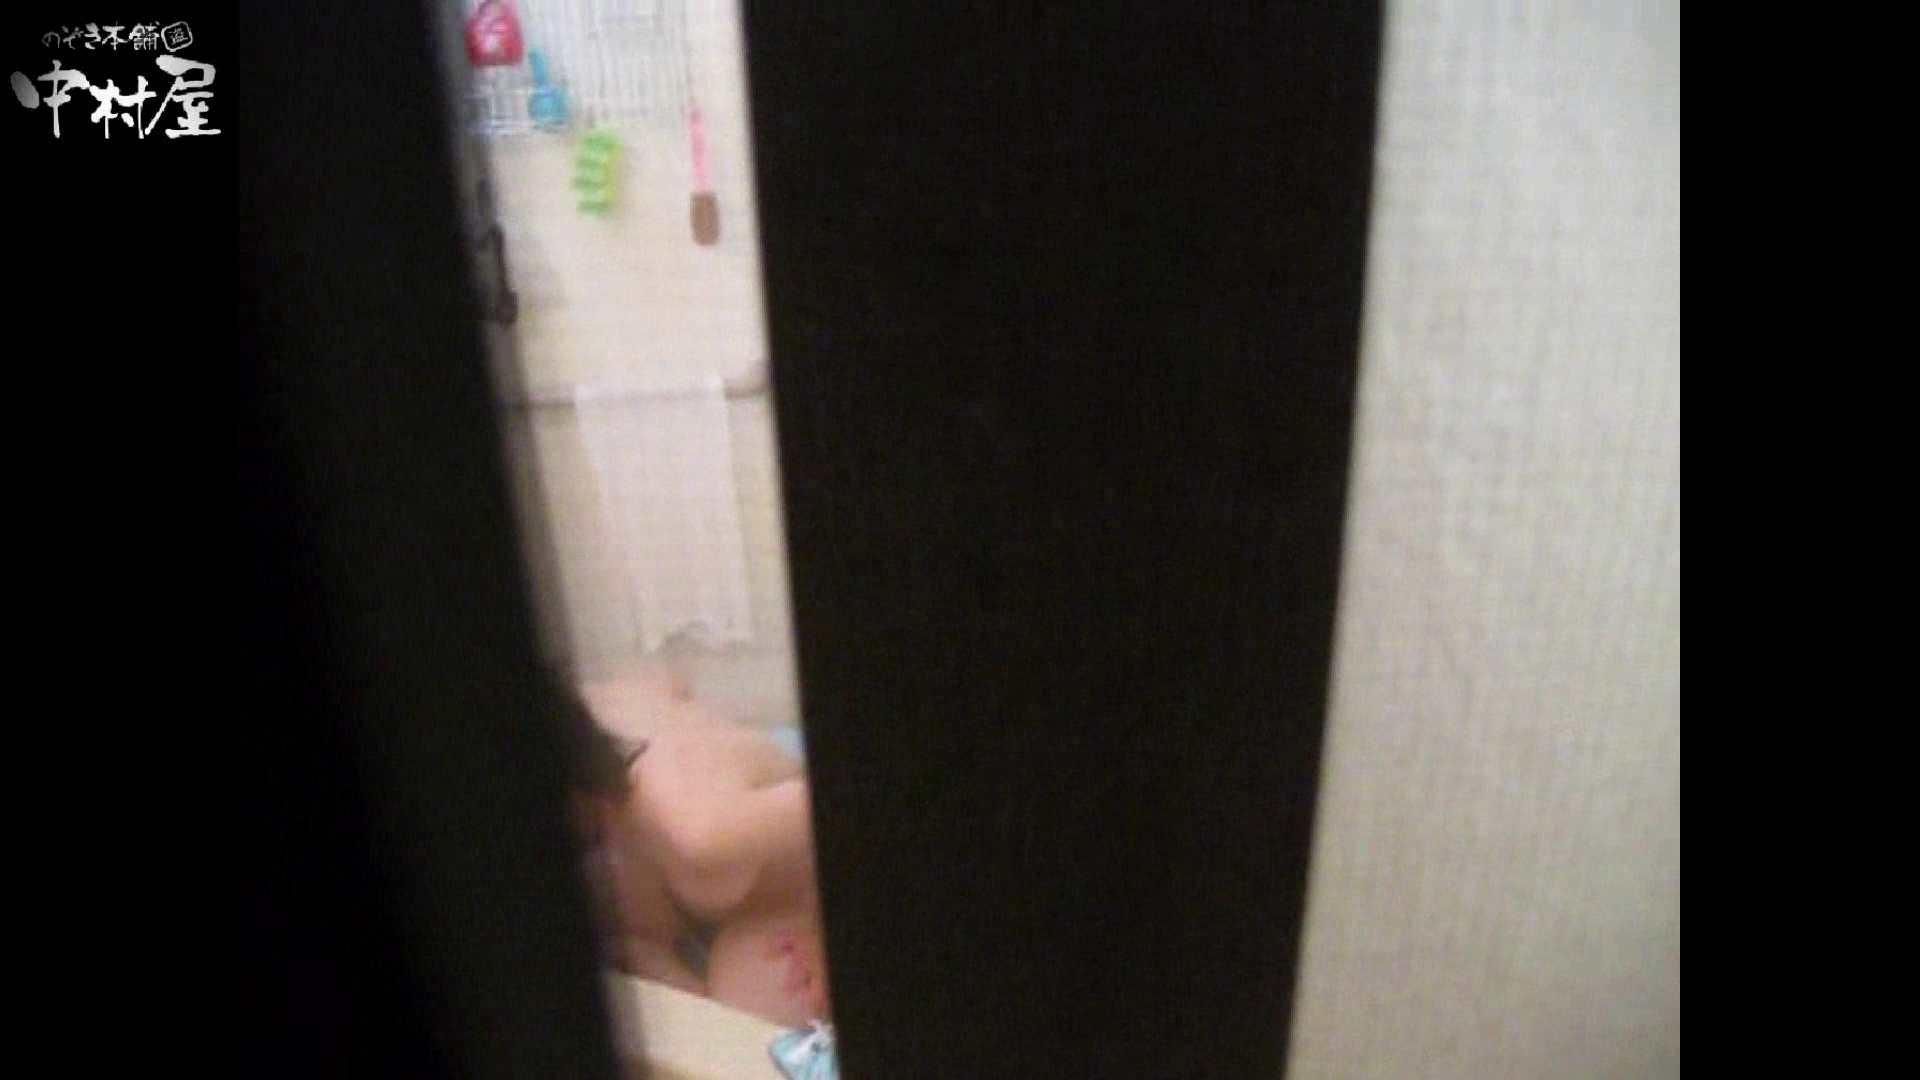 民家風呂専門盗撮師の超危険映像 vol.001 股間 | OLのエロ生活  77連発 1